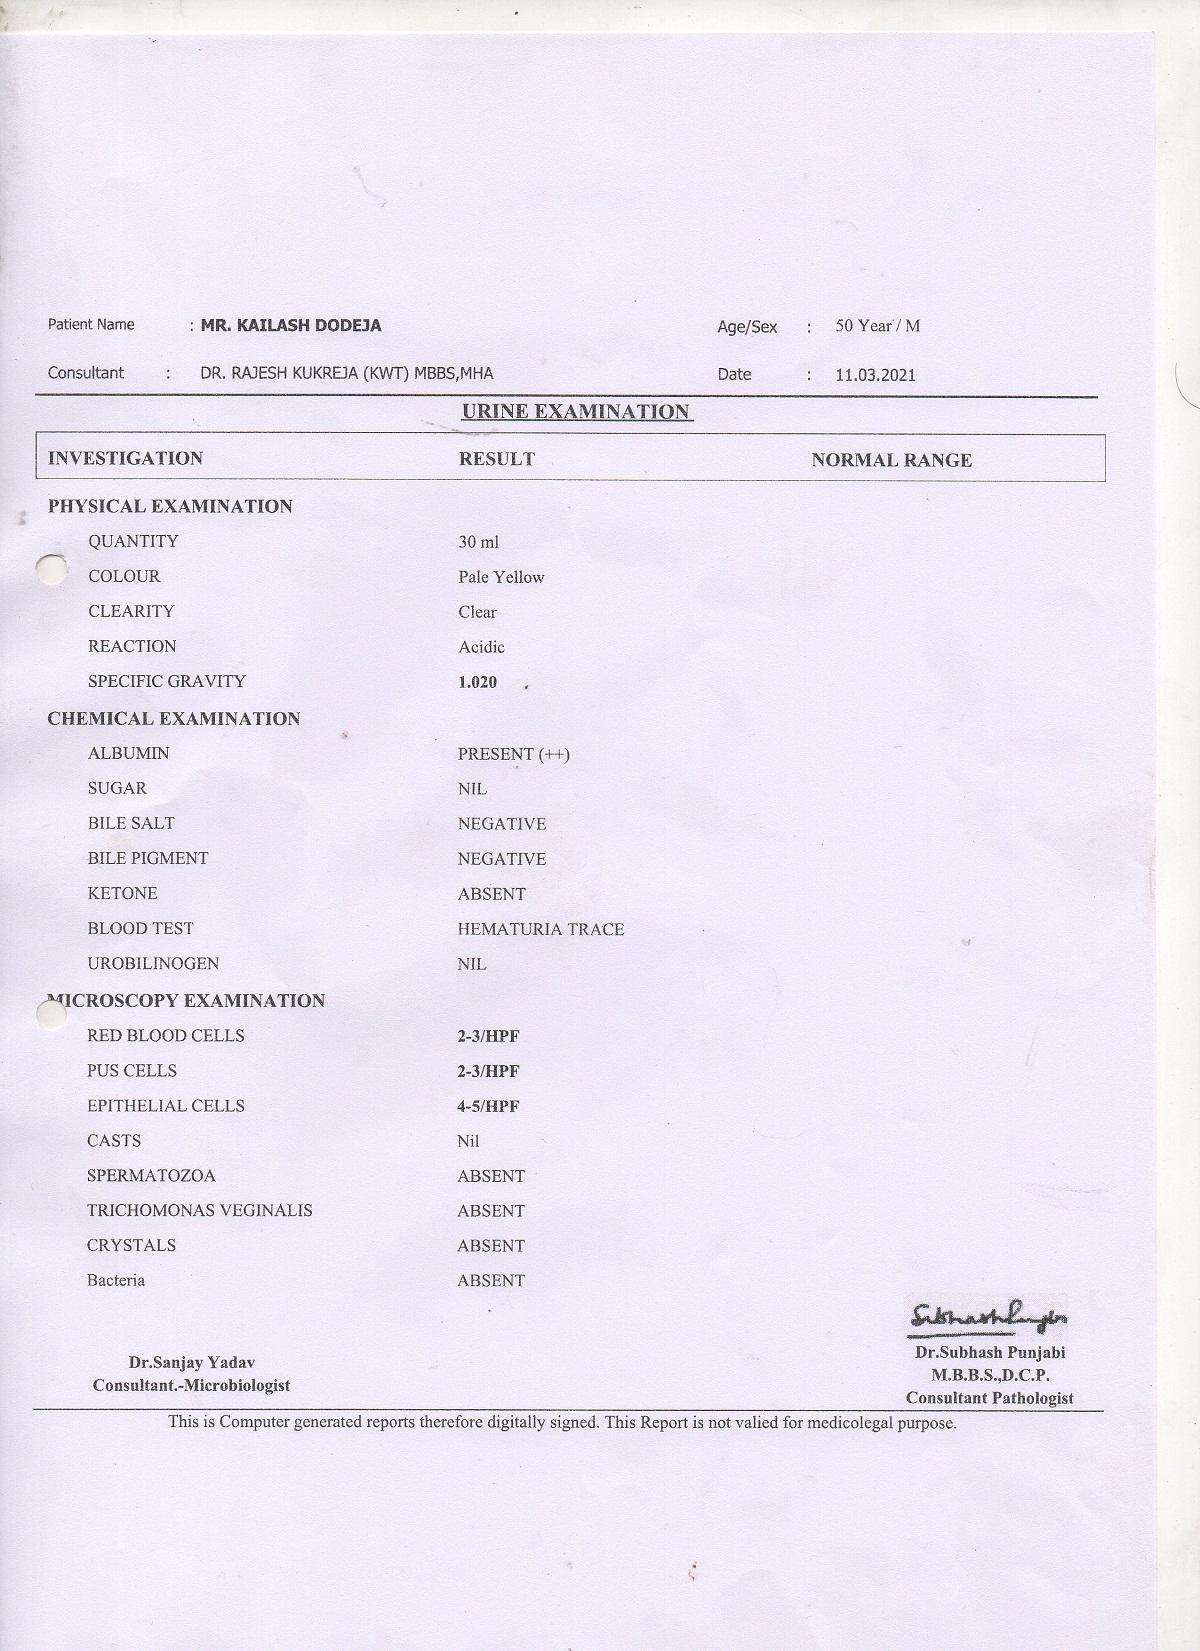 kailash-kumar-doodeja-kidney-treatment-04